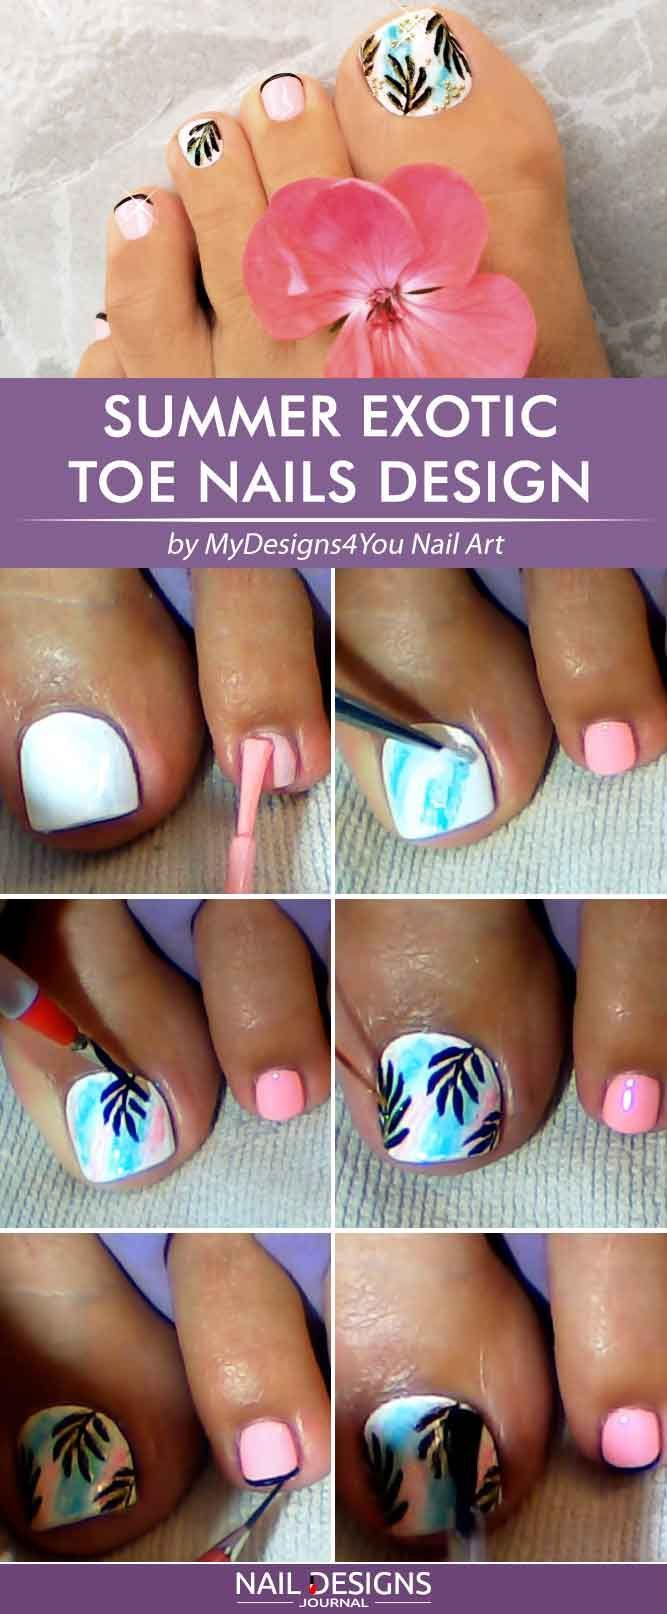 Simple Diy Toe Nail Designs Naildesignsjournal Com Toe Nail Designs Toe Nails Diy Nail Designs